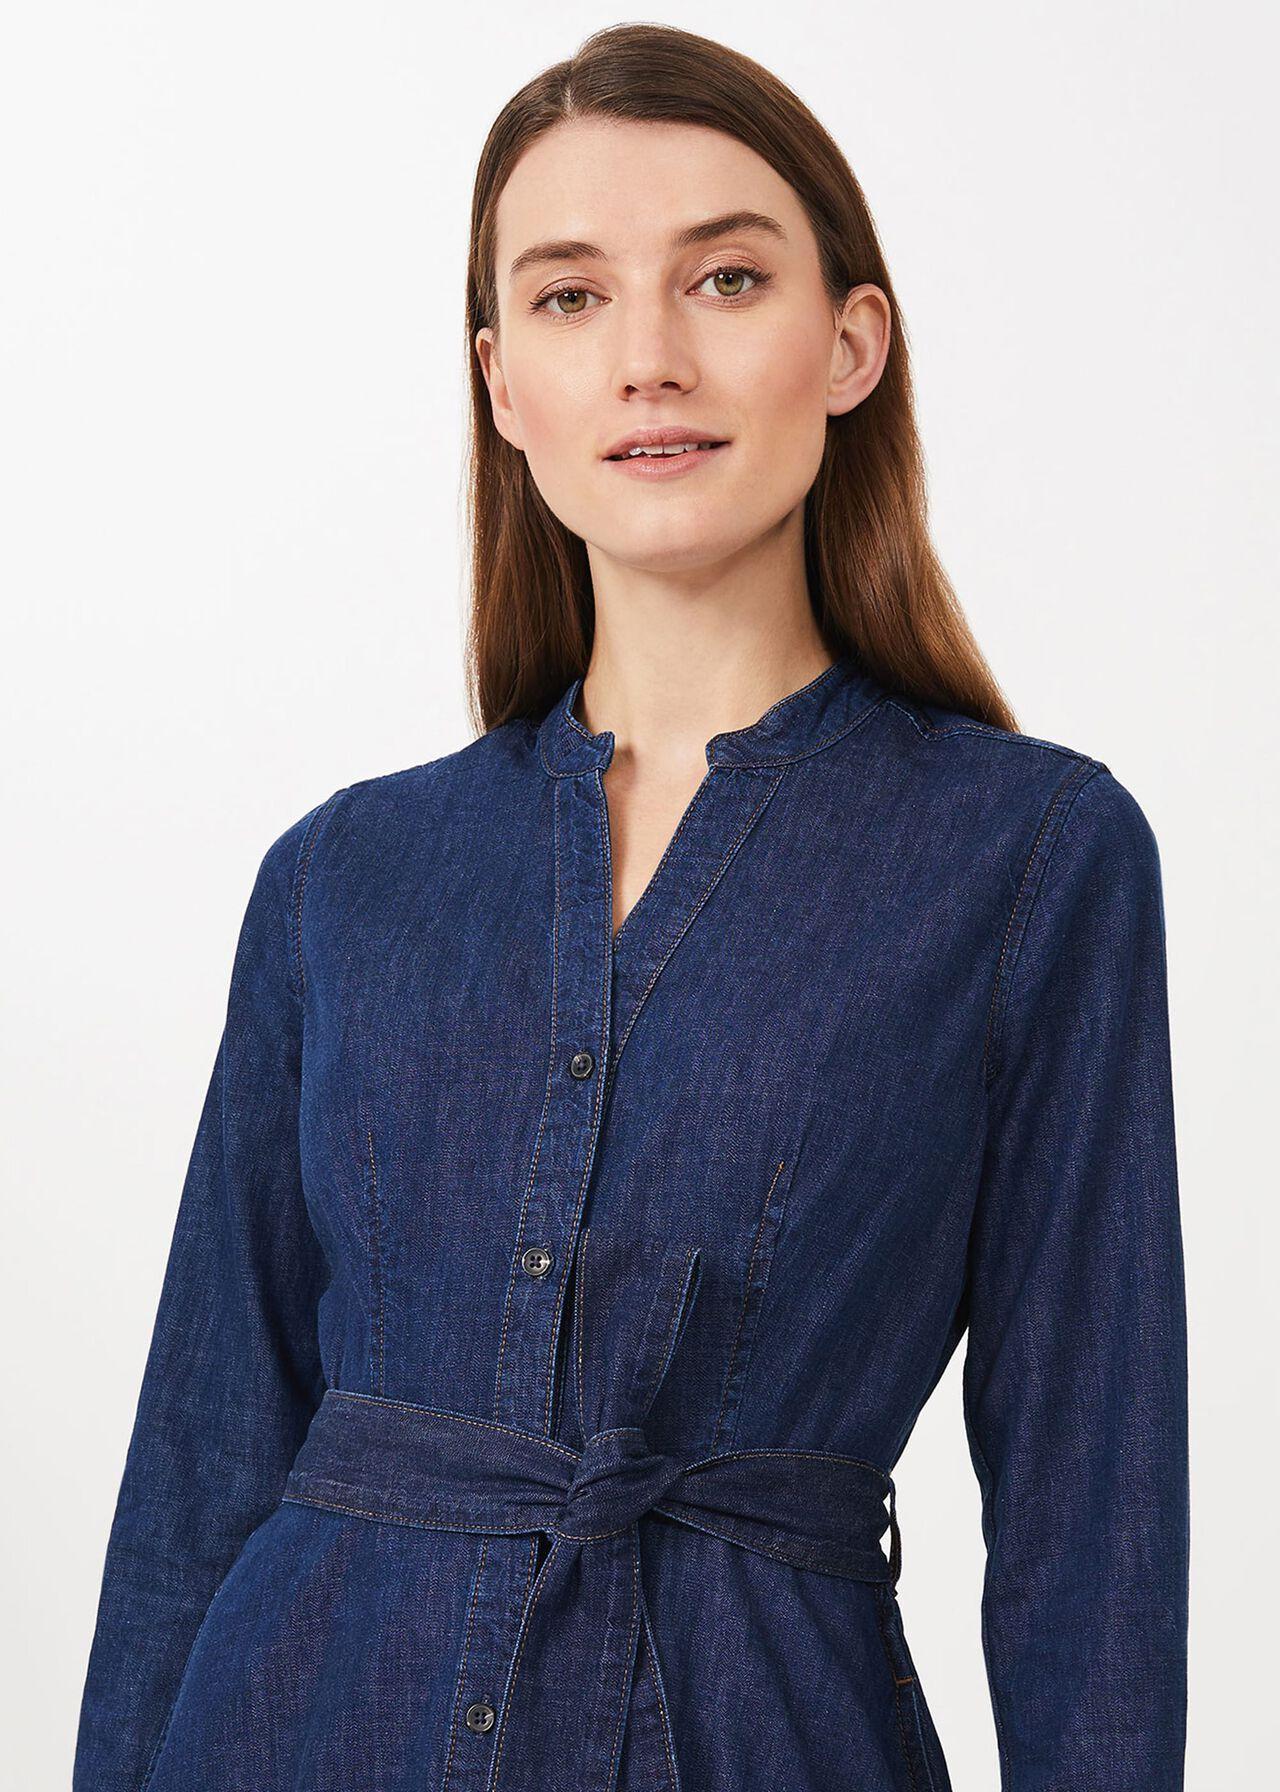 Taylor Denim Dress, Blue, hi-res